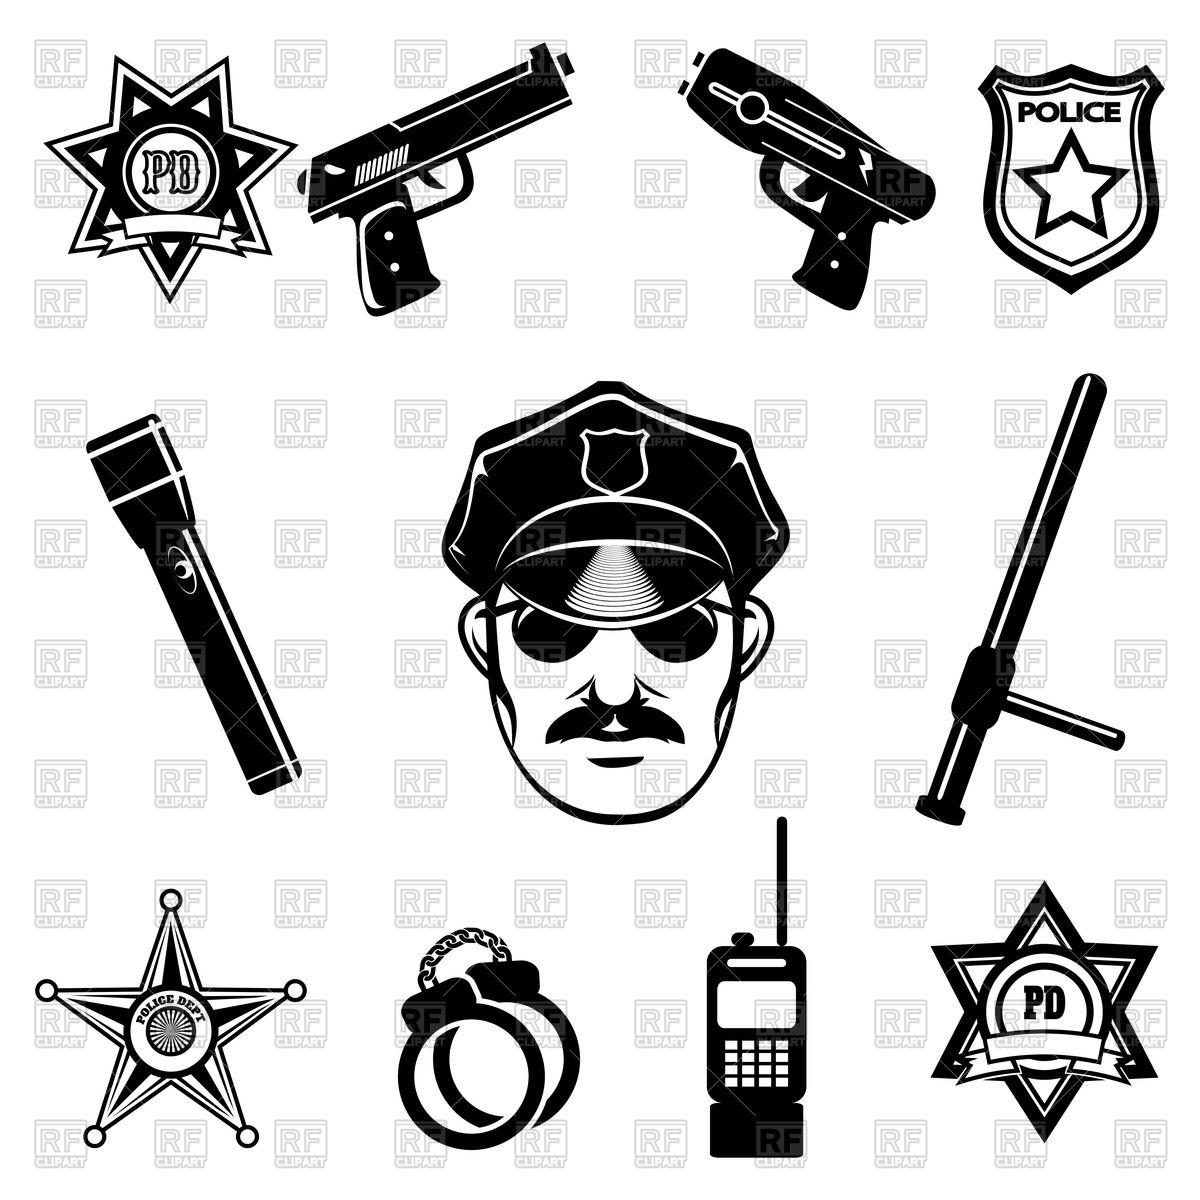 Police symbols.